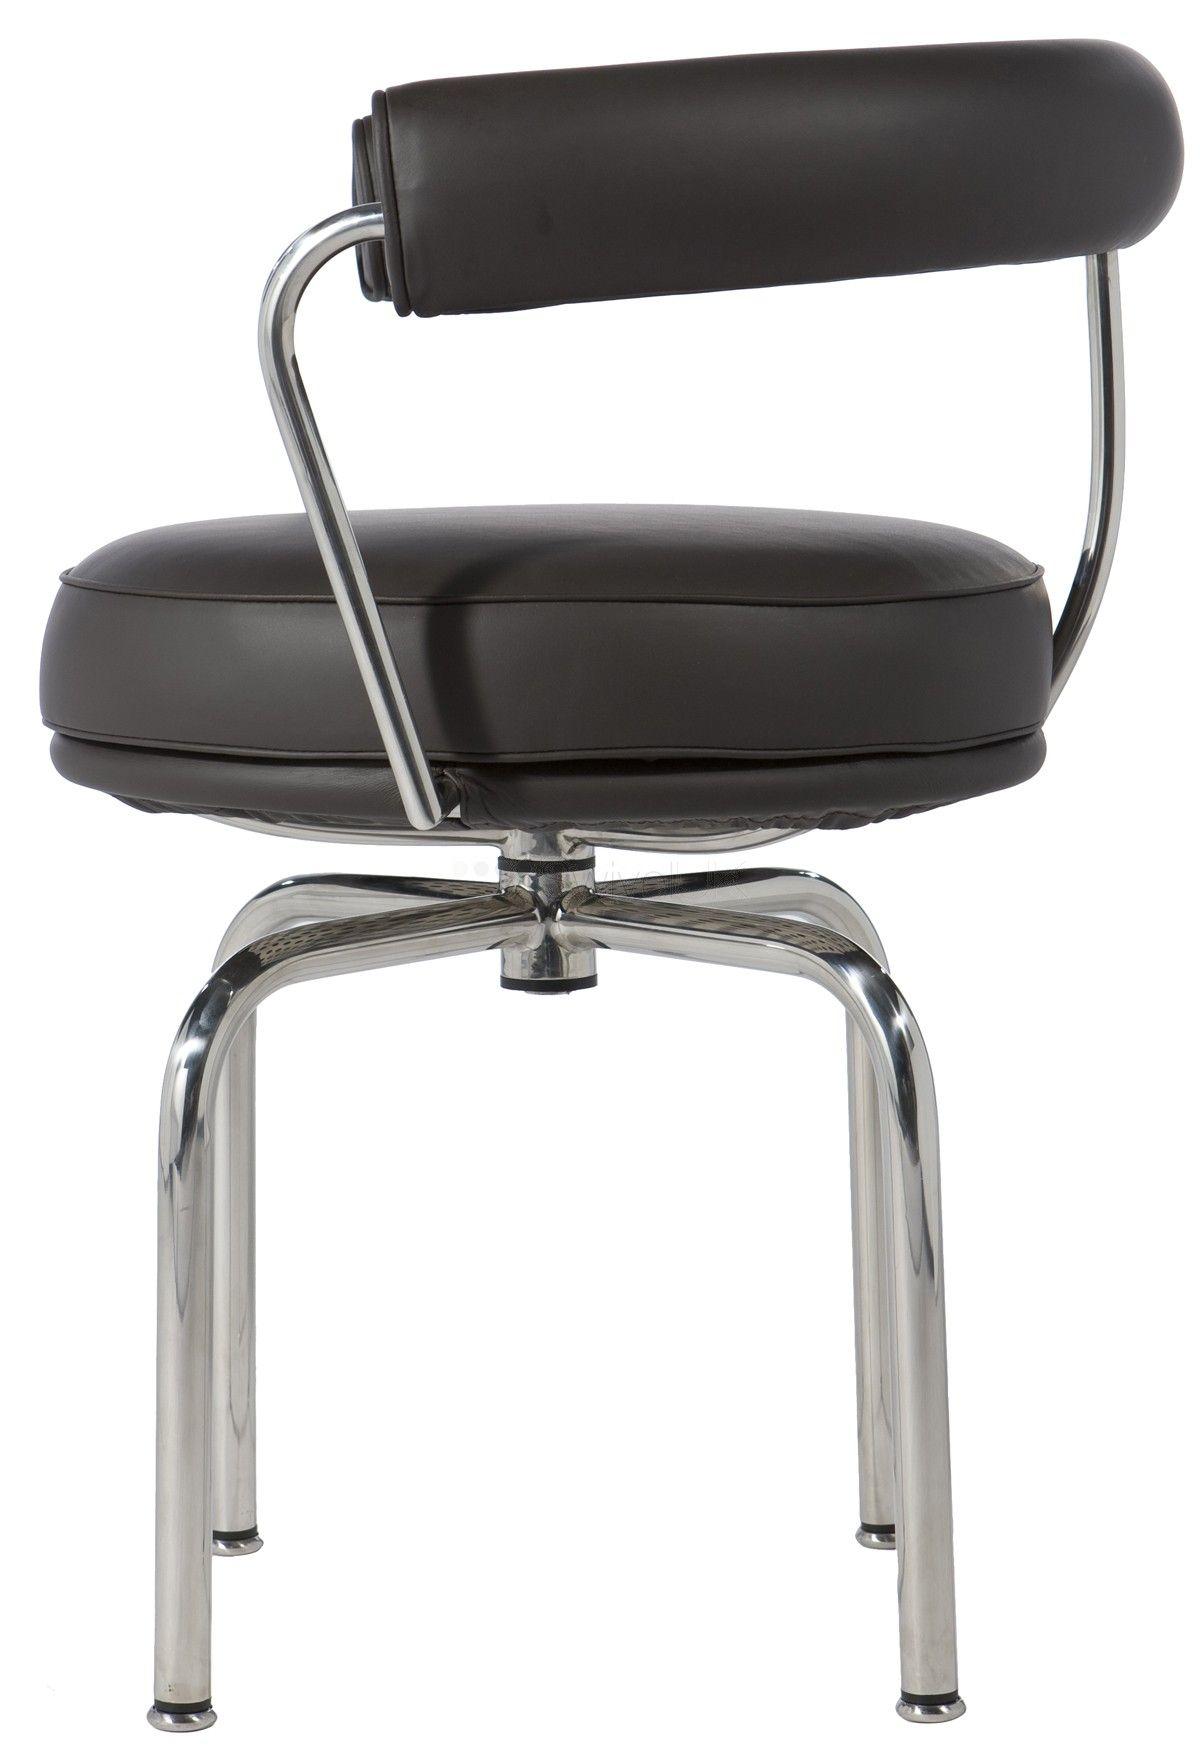 Lc7 Le Corbusier Furniture Design Pinterest Classic  # Muebles Bobrick